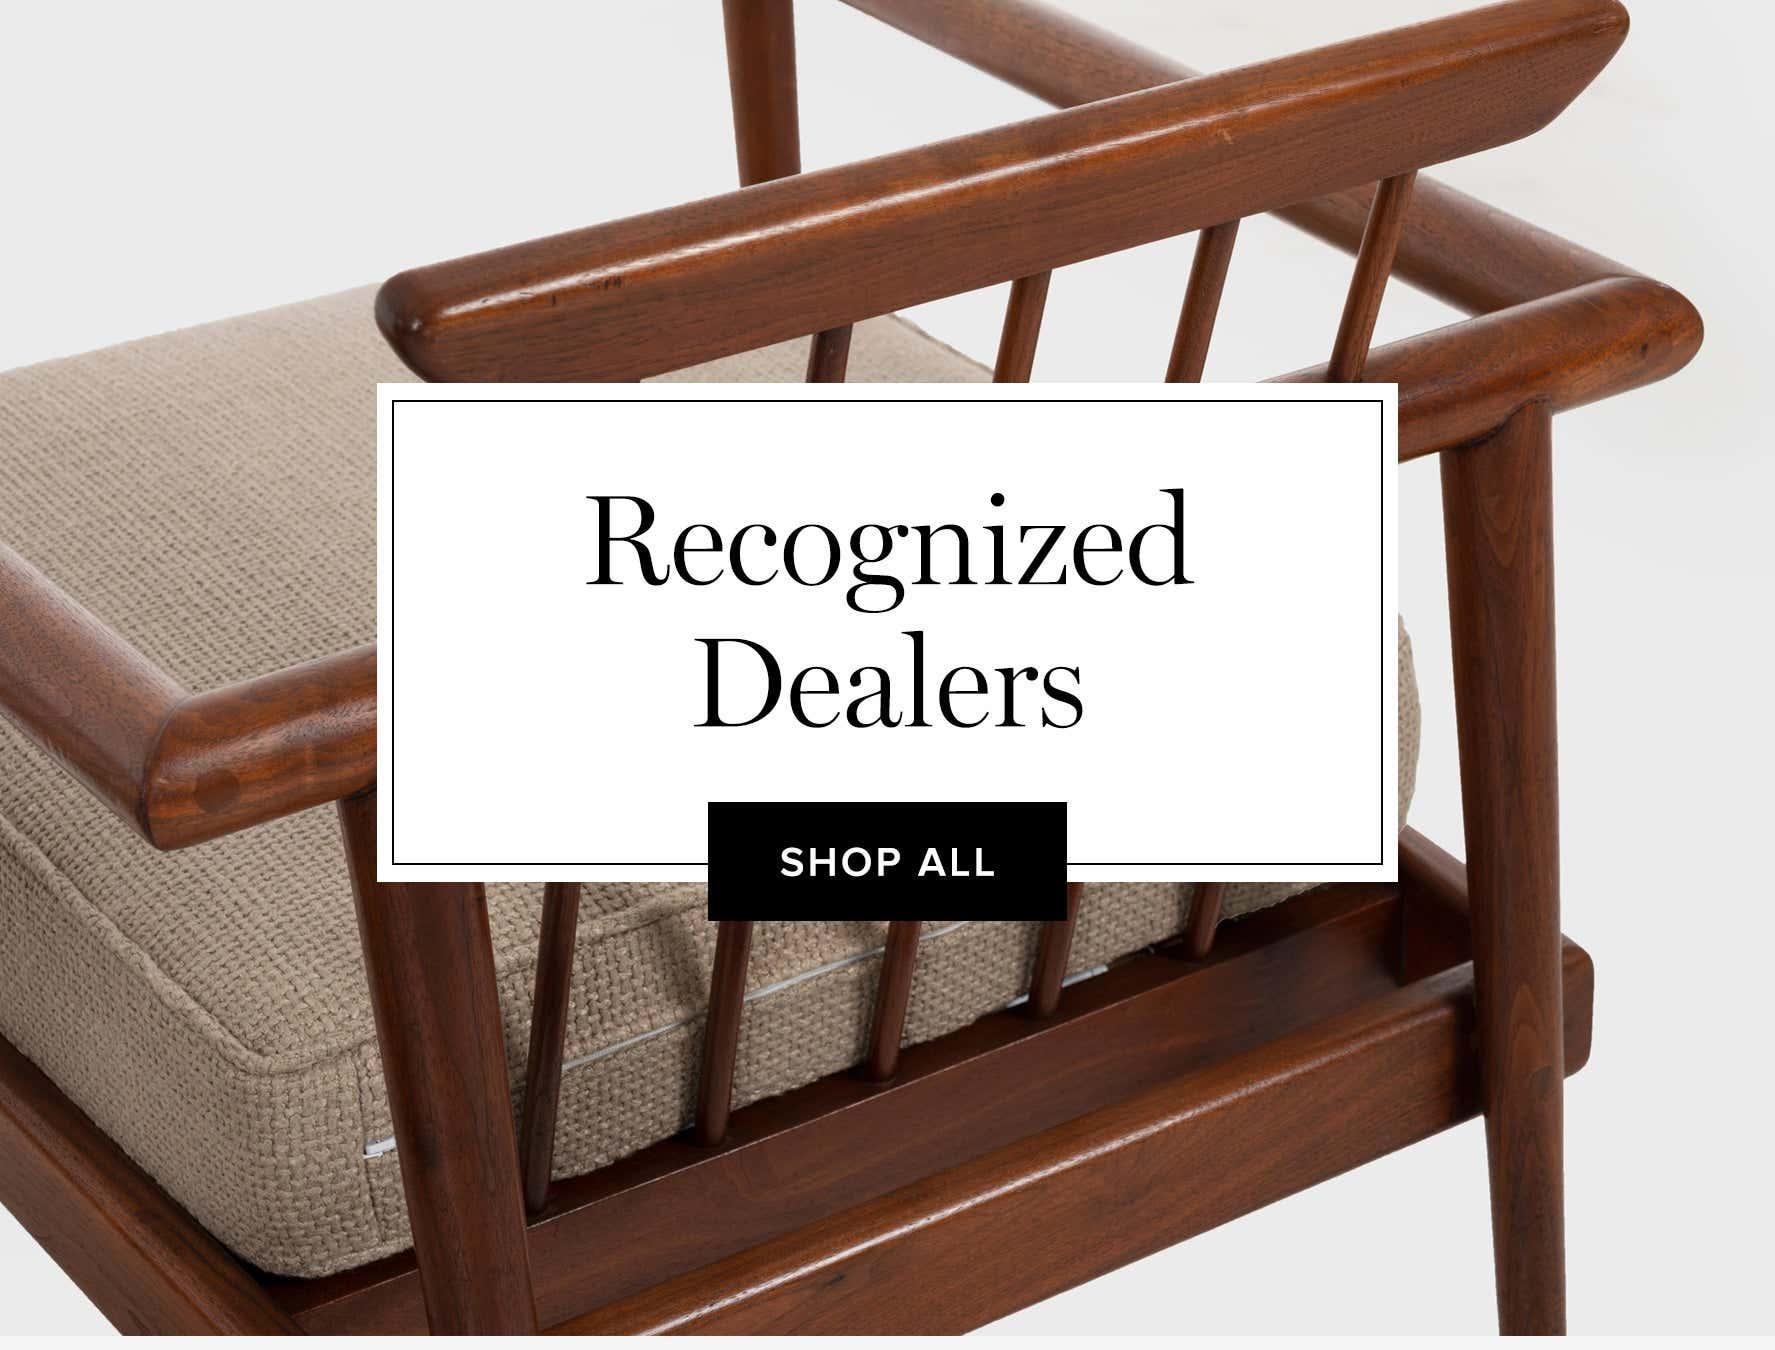 Recognized Dealers